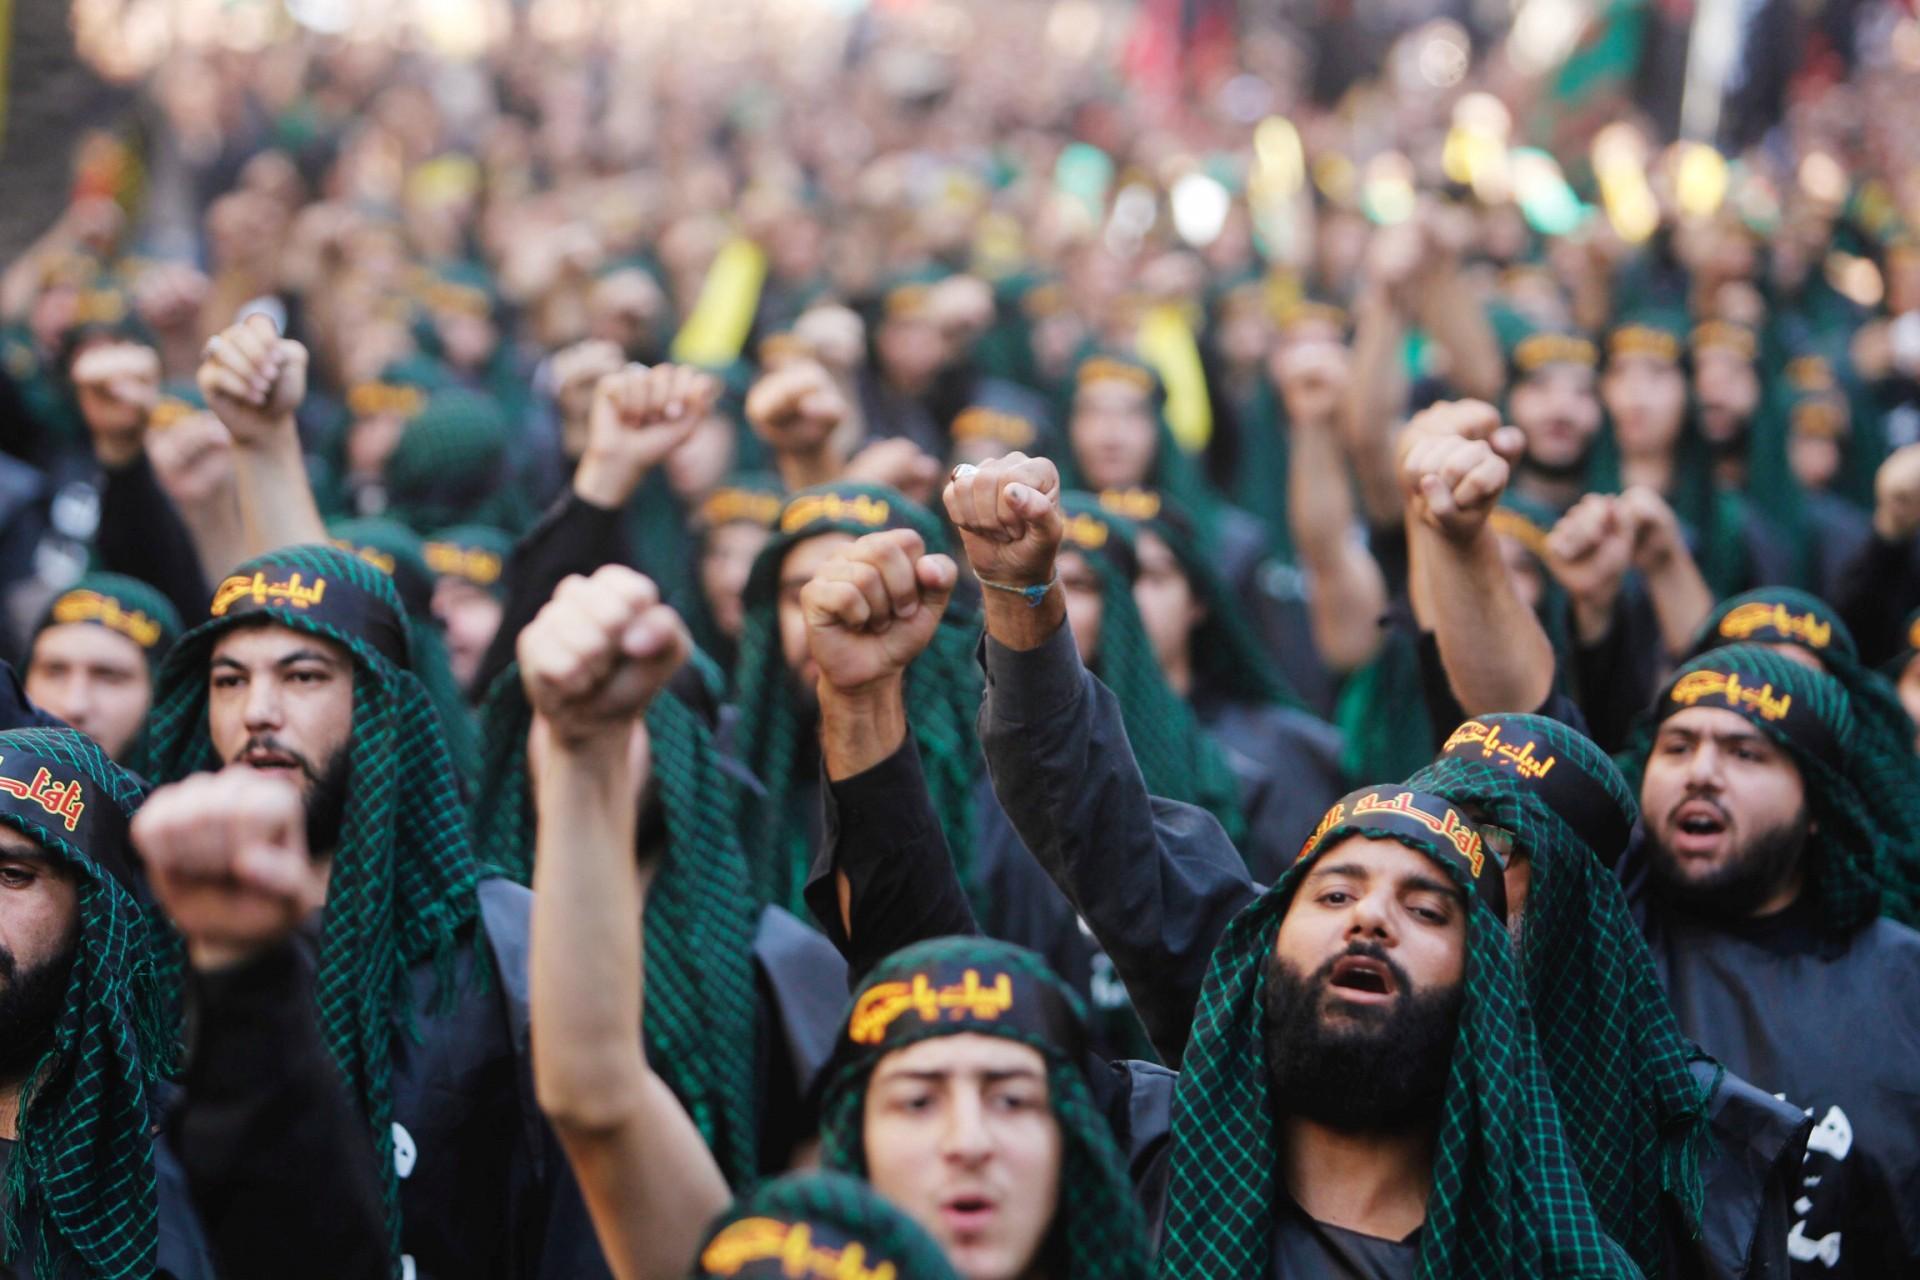 Lebanon's Hezbollah supporters chant slogans during last day of Ashura, in Beirut, Lebanon September 20, 2018. REUTERS/Aziz Taher